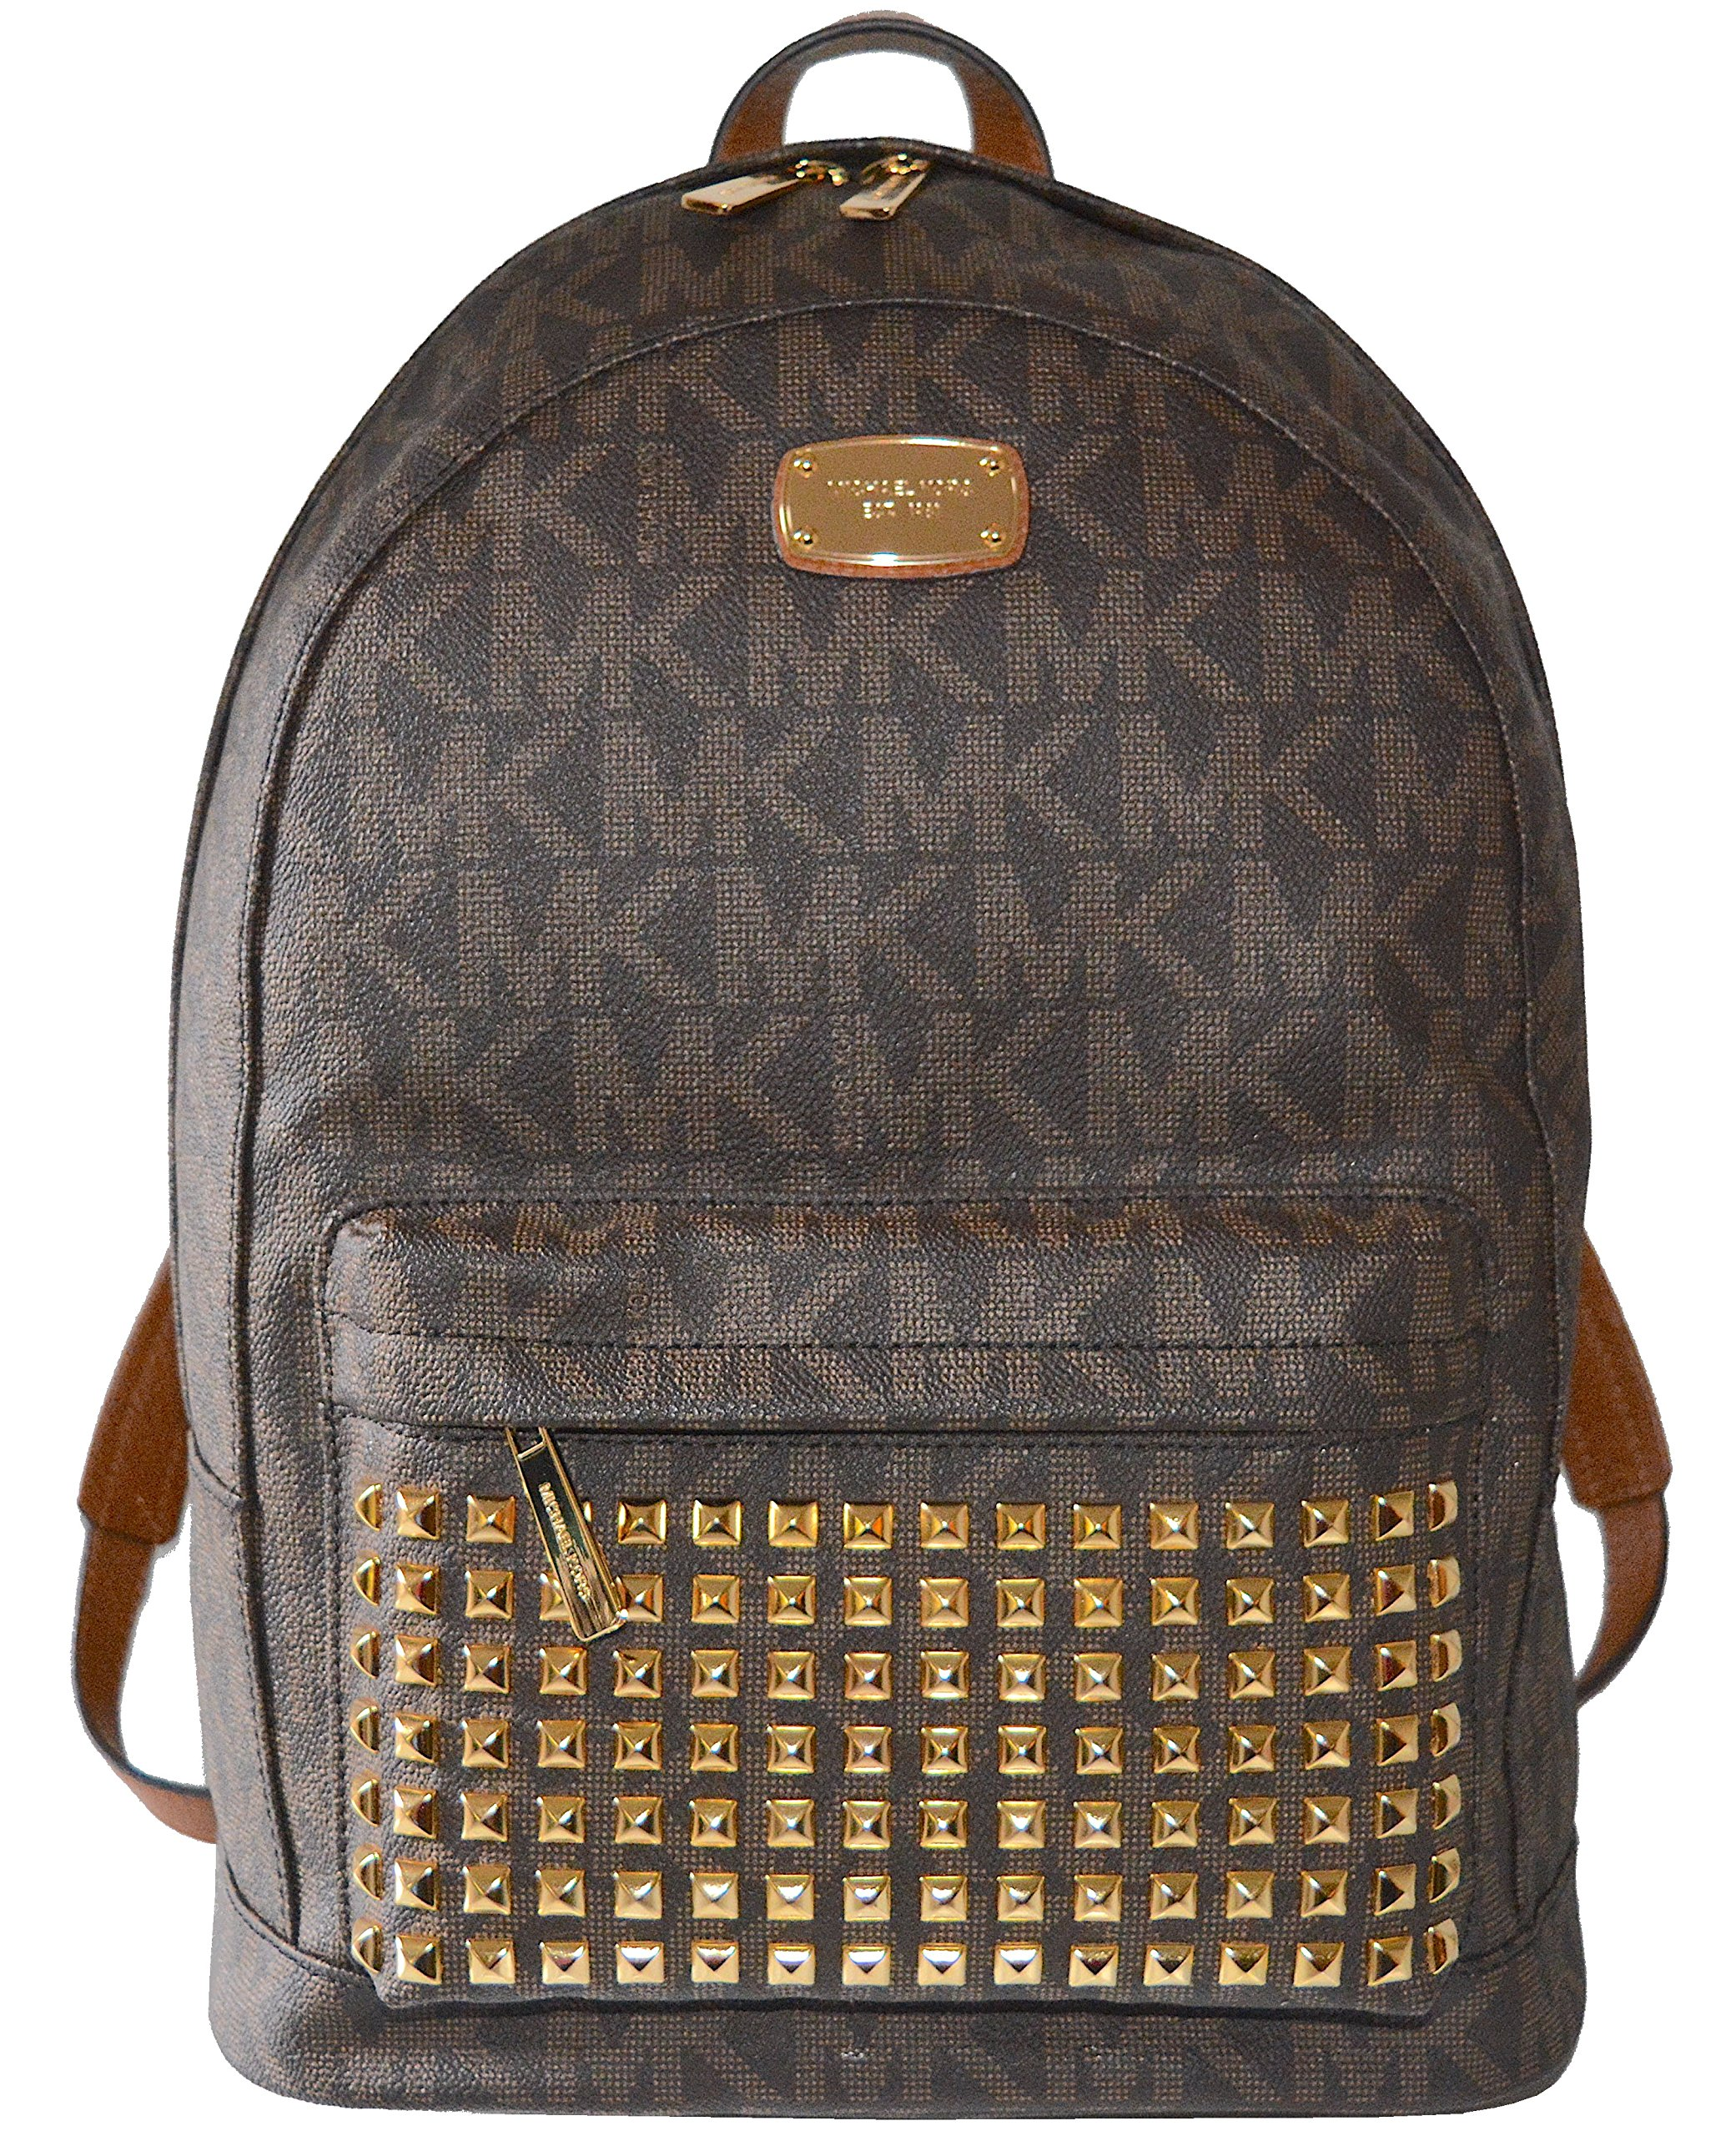 3c8e553c7434 Galleon - Michael Kors Studded Jet Set Large Backpack PVC (Brown)